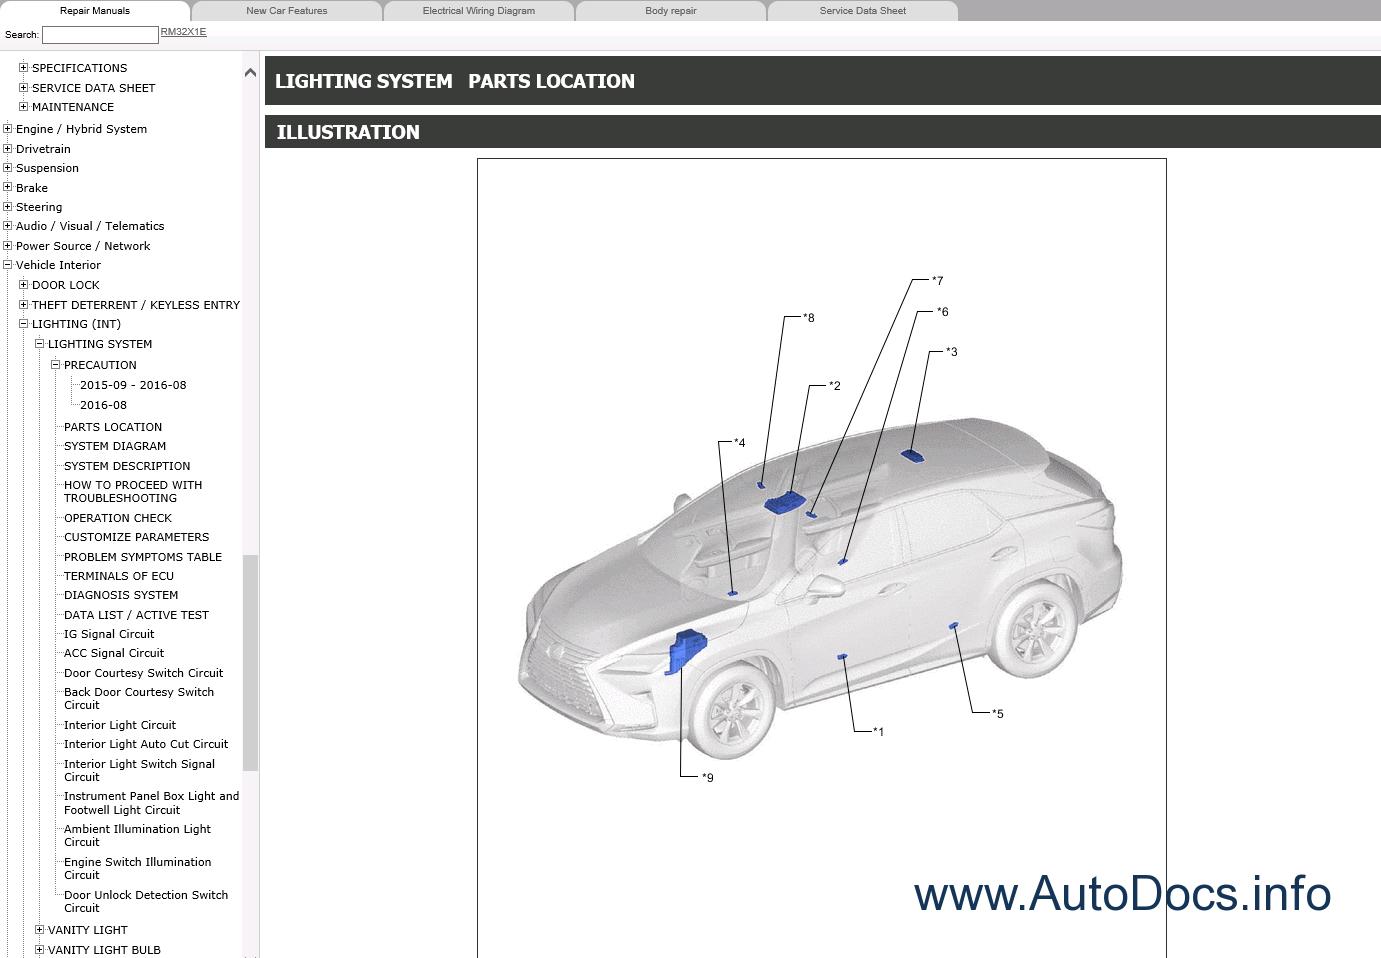 2009 Lexus Rx 350 Service Manual Basic Instruction Isf Wiring Diagram Is F Pdf 250 Choice